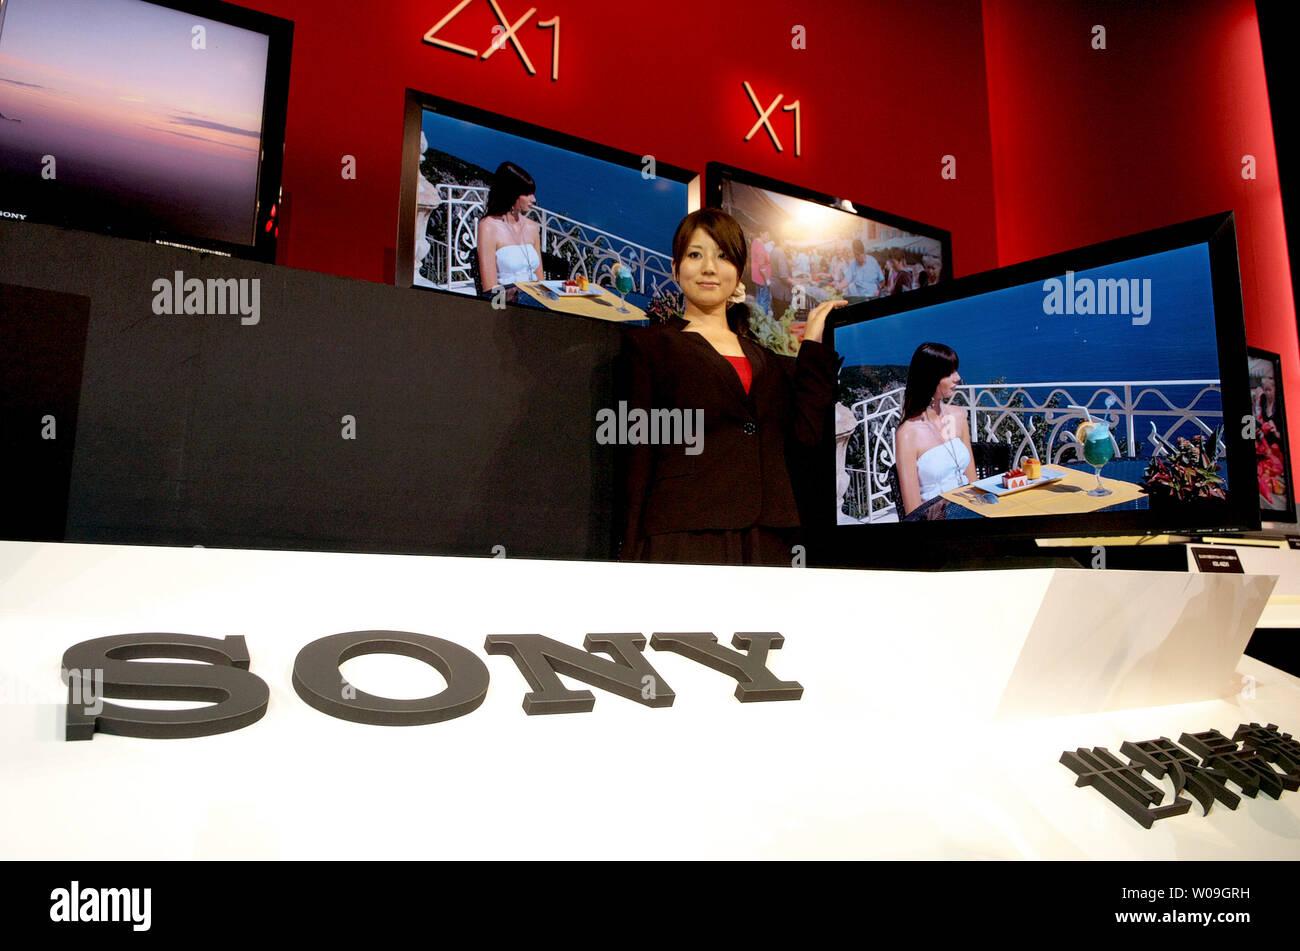 Sony Bravia Stock Photos & Sony Bravia Stock Images - Alamy